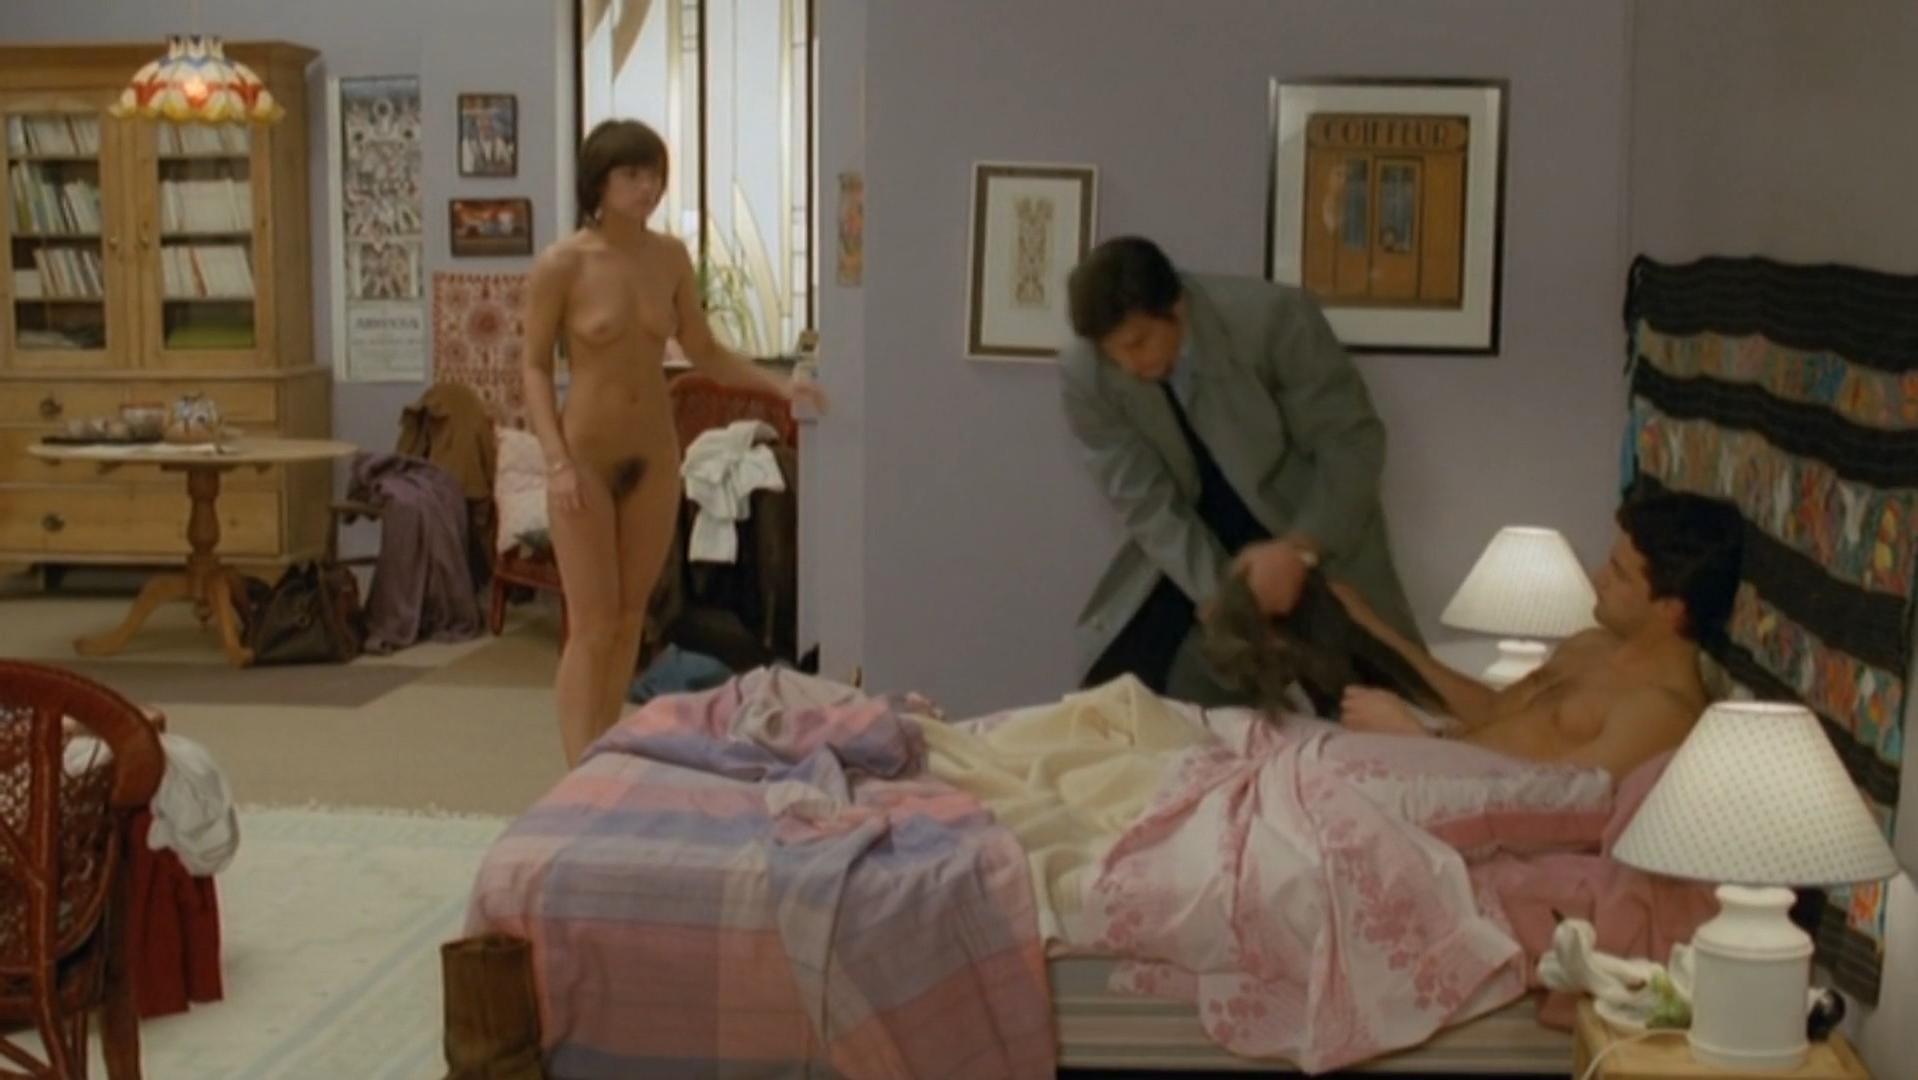 Catherine Leprince nude - Le choc (1982)